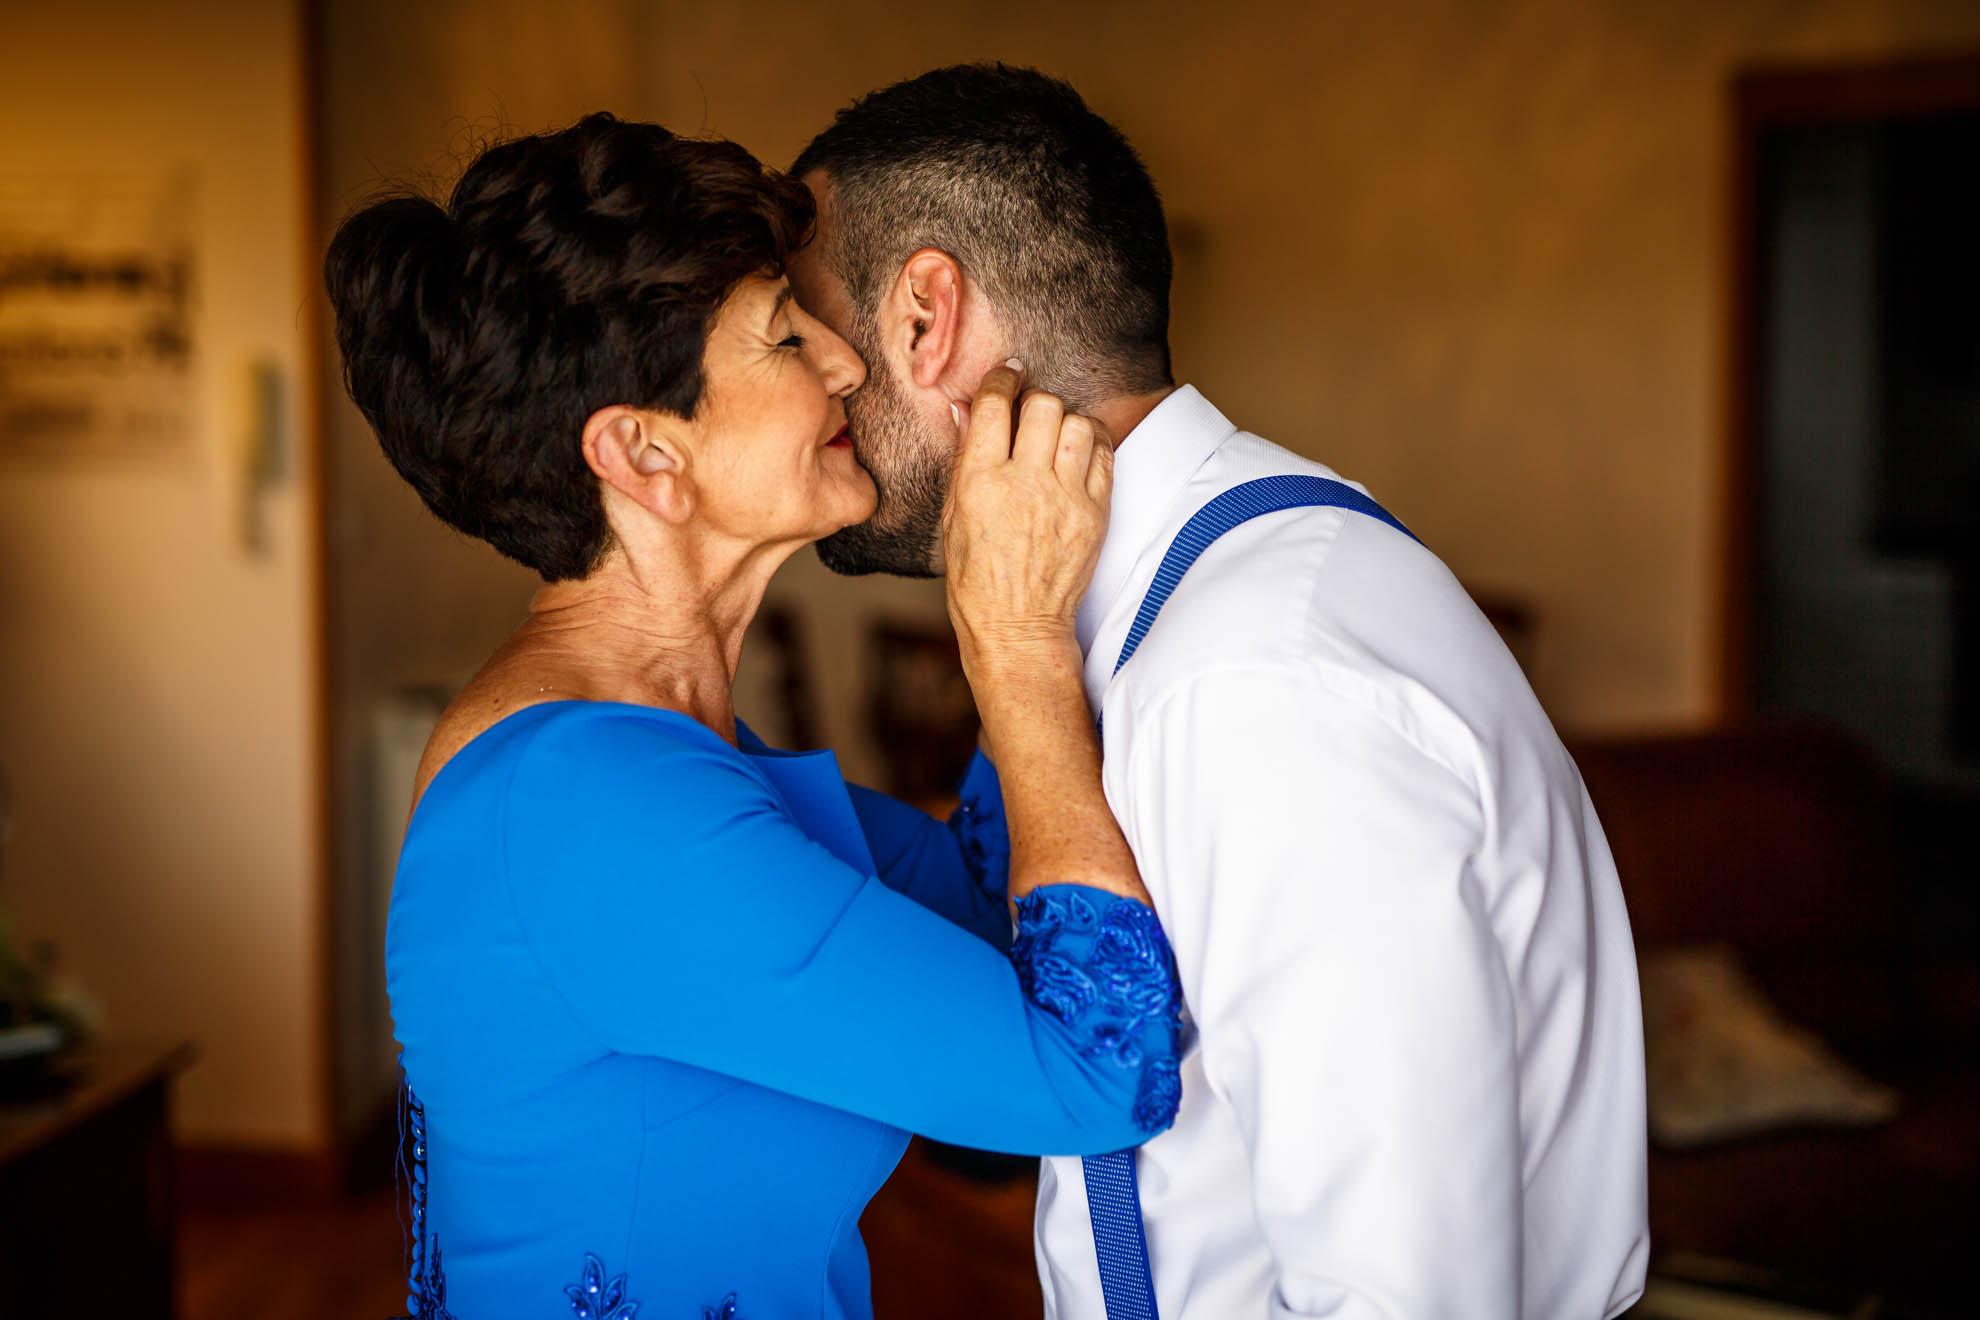 madre besa a su hijo